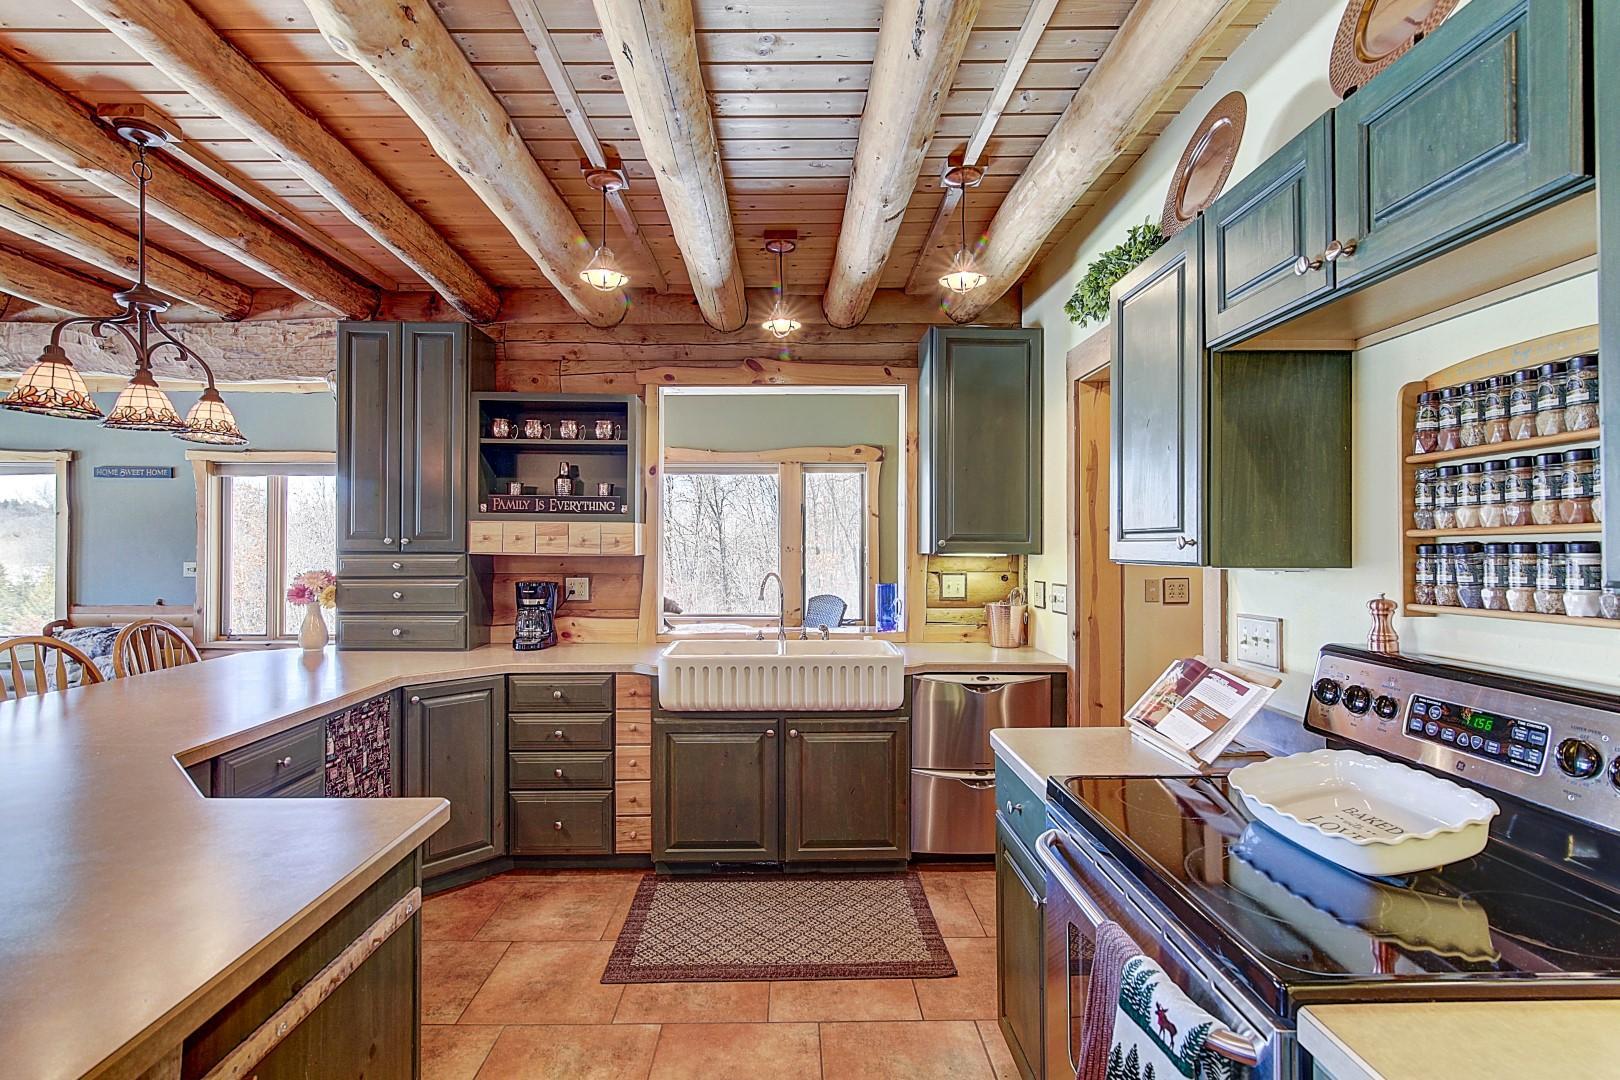 Custom Cabinets w/Upper & Lower Lighting